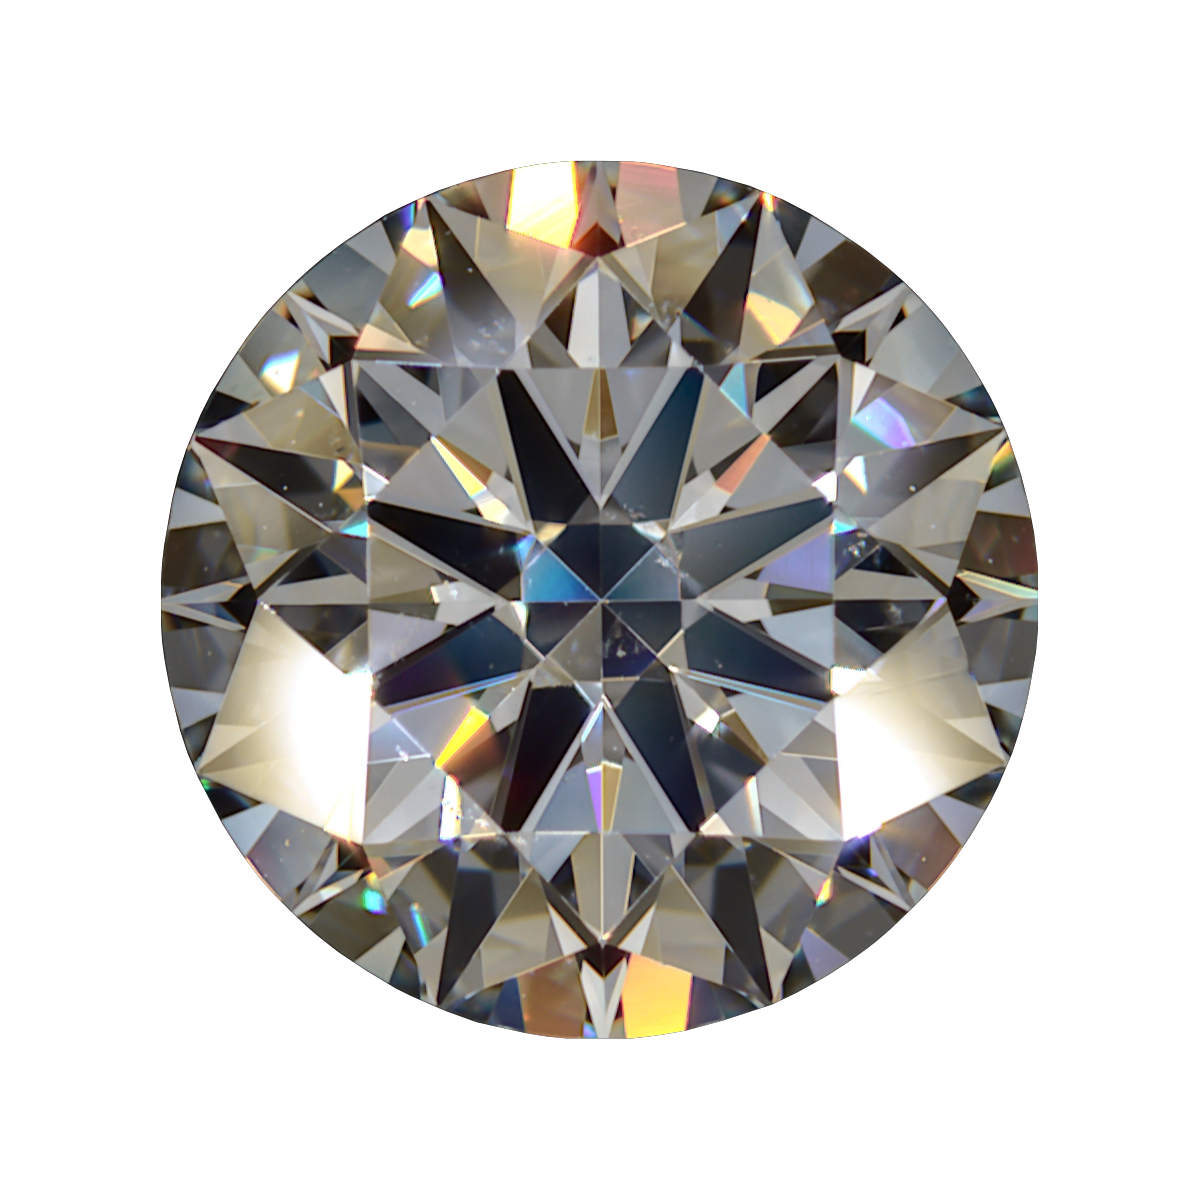 https://cdn.briangavindiamonds.com/files/mp4/BLAGS-104073209004/BLAGS-104073209004-Fire-02.mp4